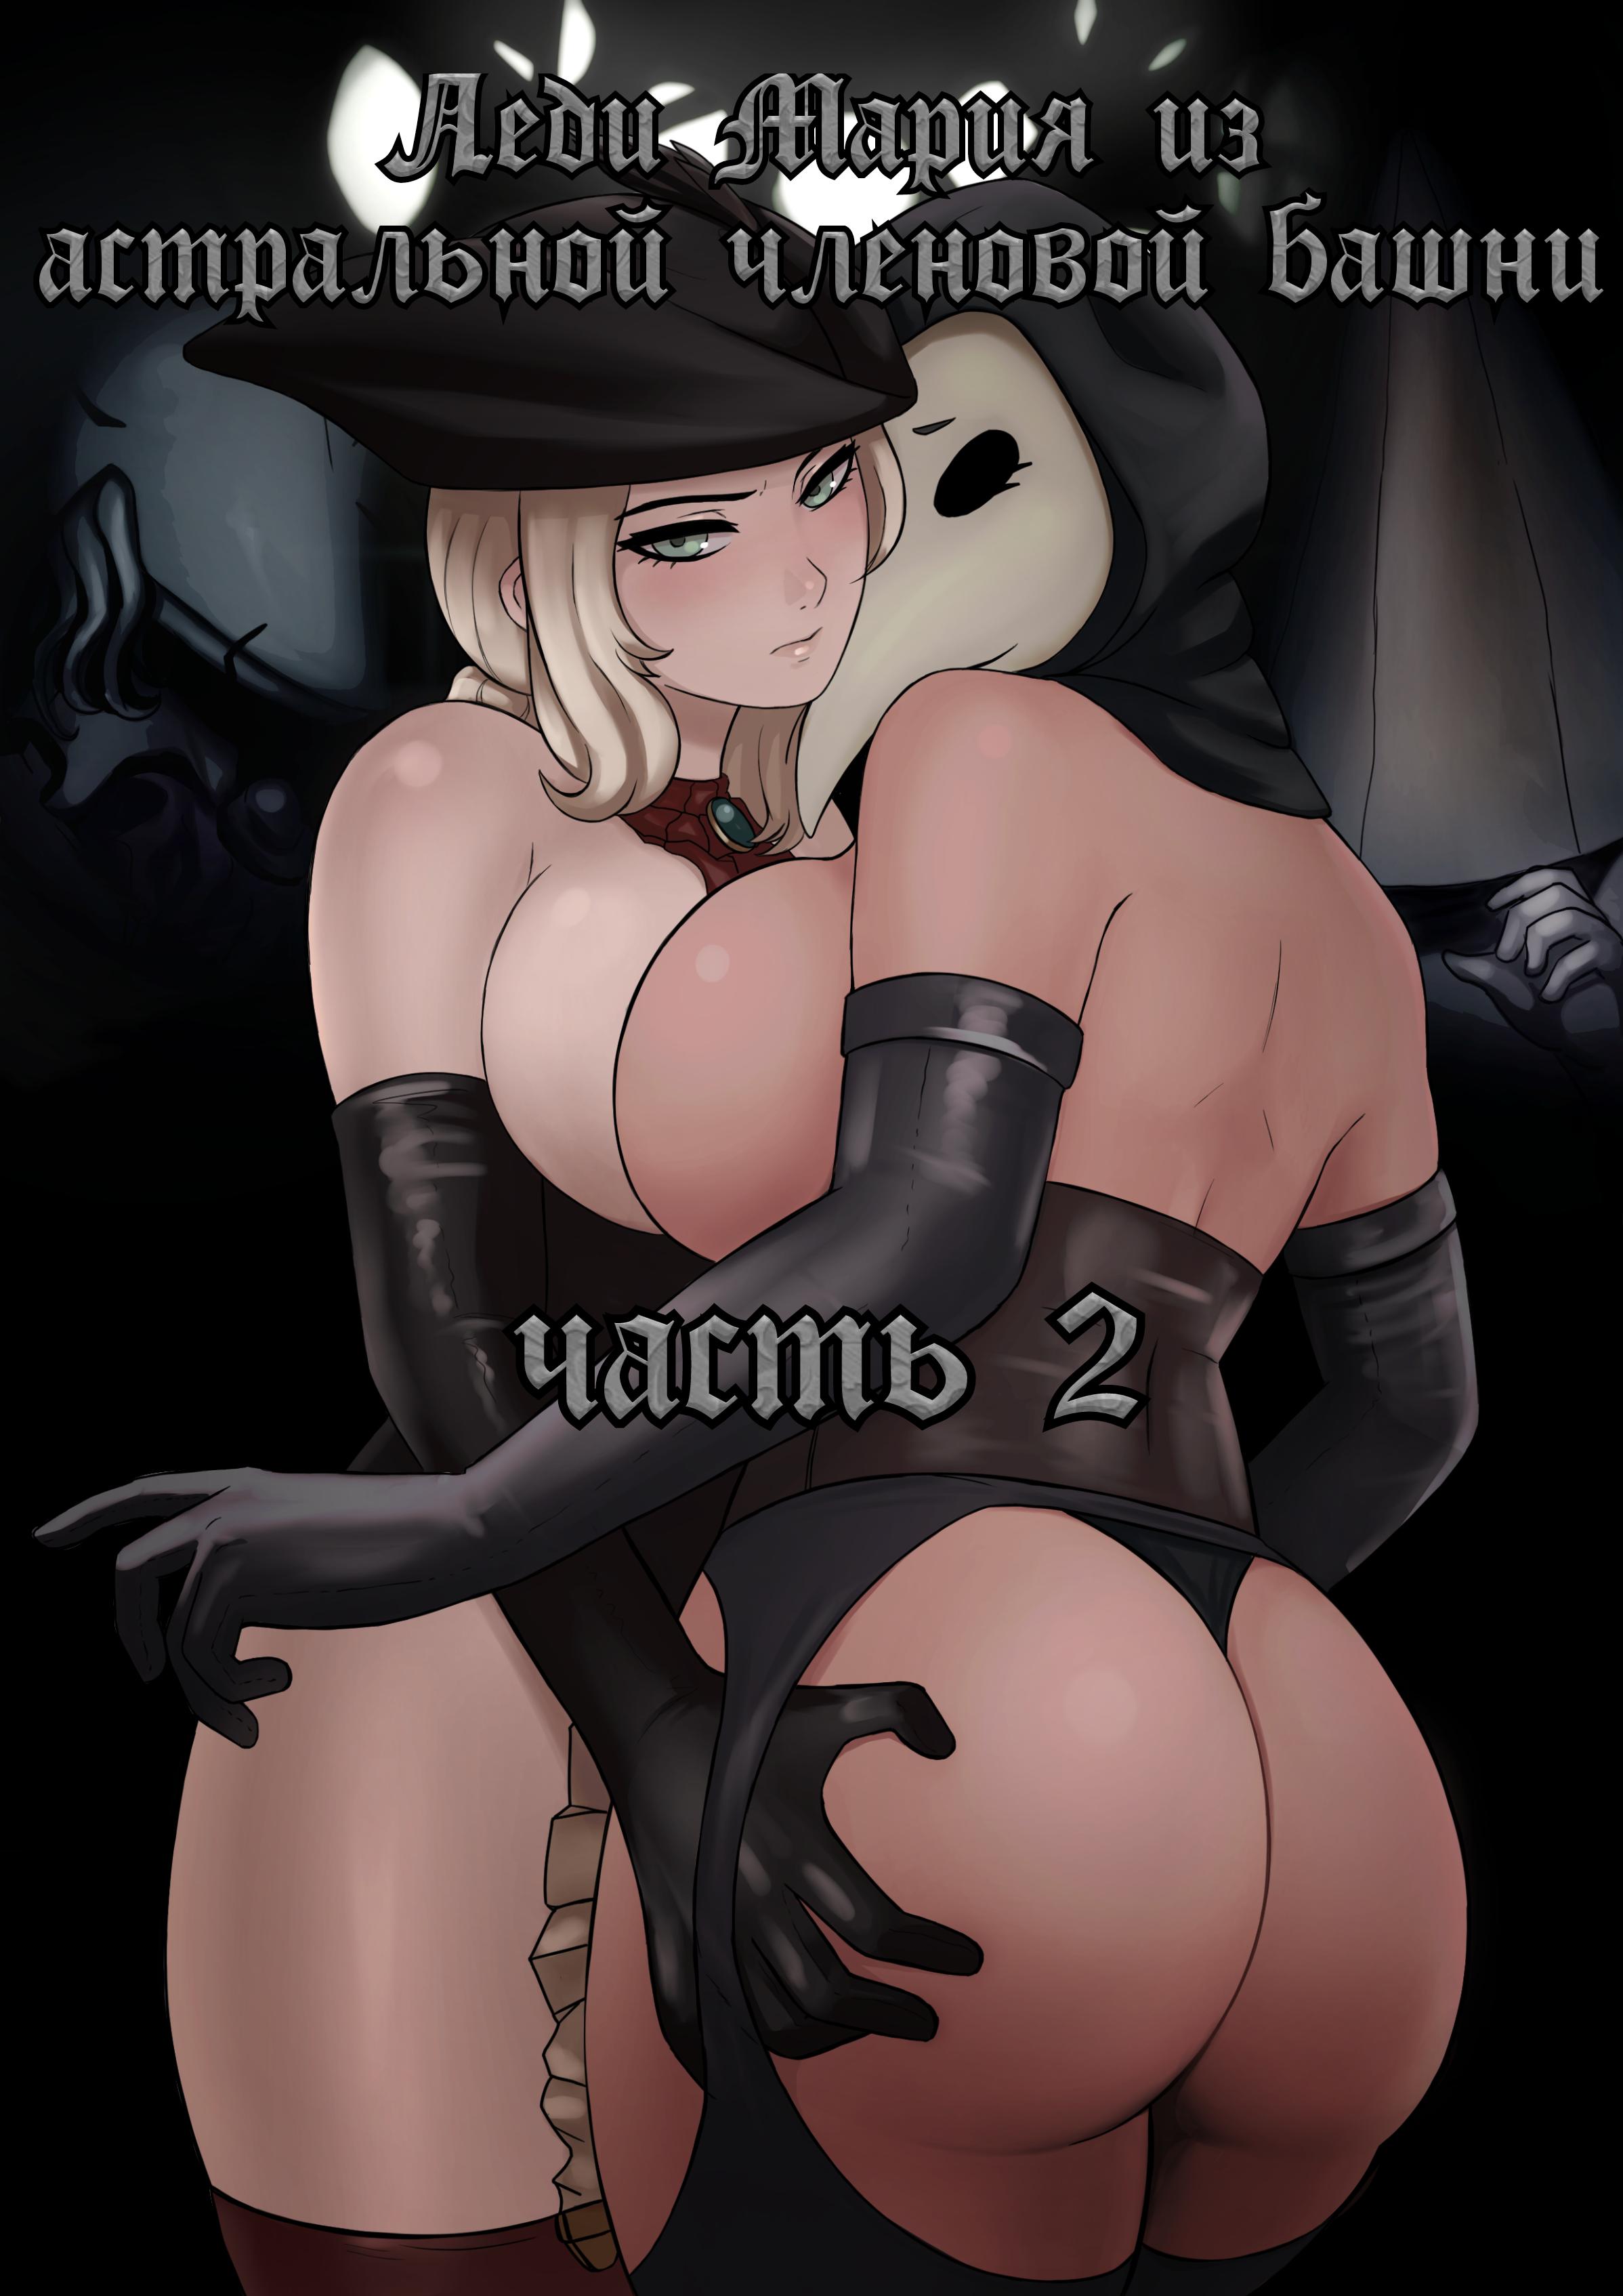 nowajoestar bloodborne hentai comic new cover